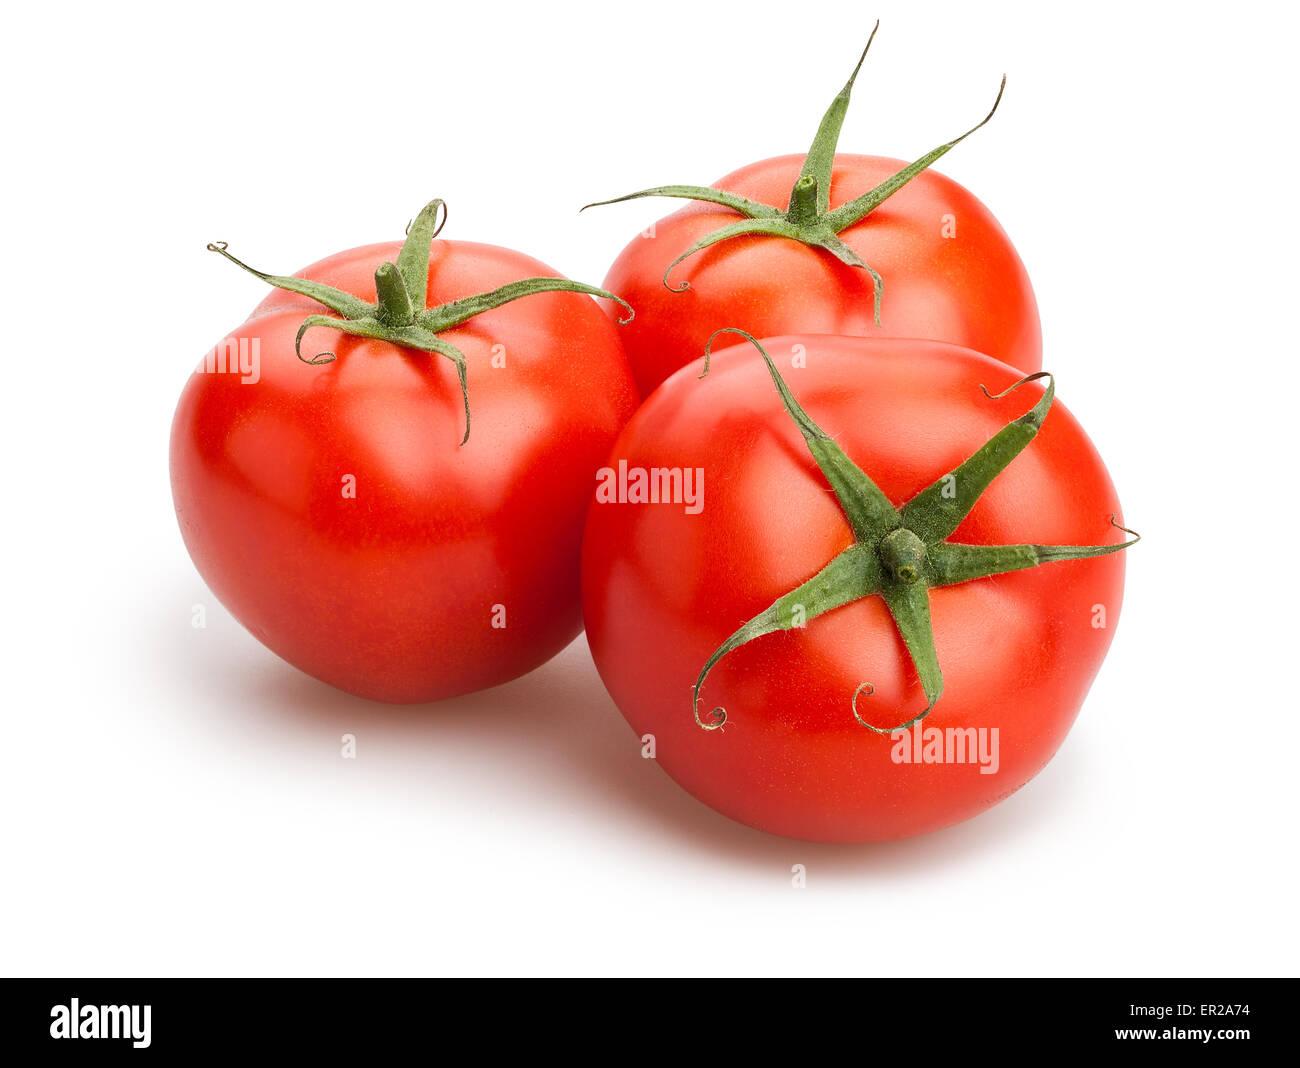 tomatoes isolated - Stock Image